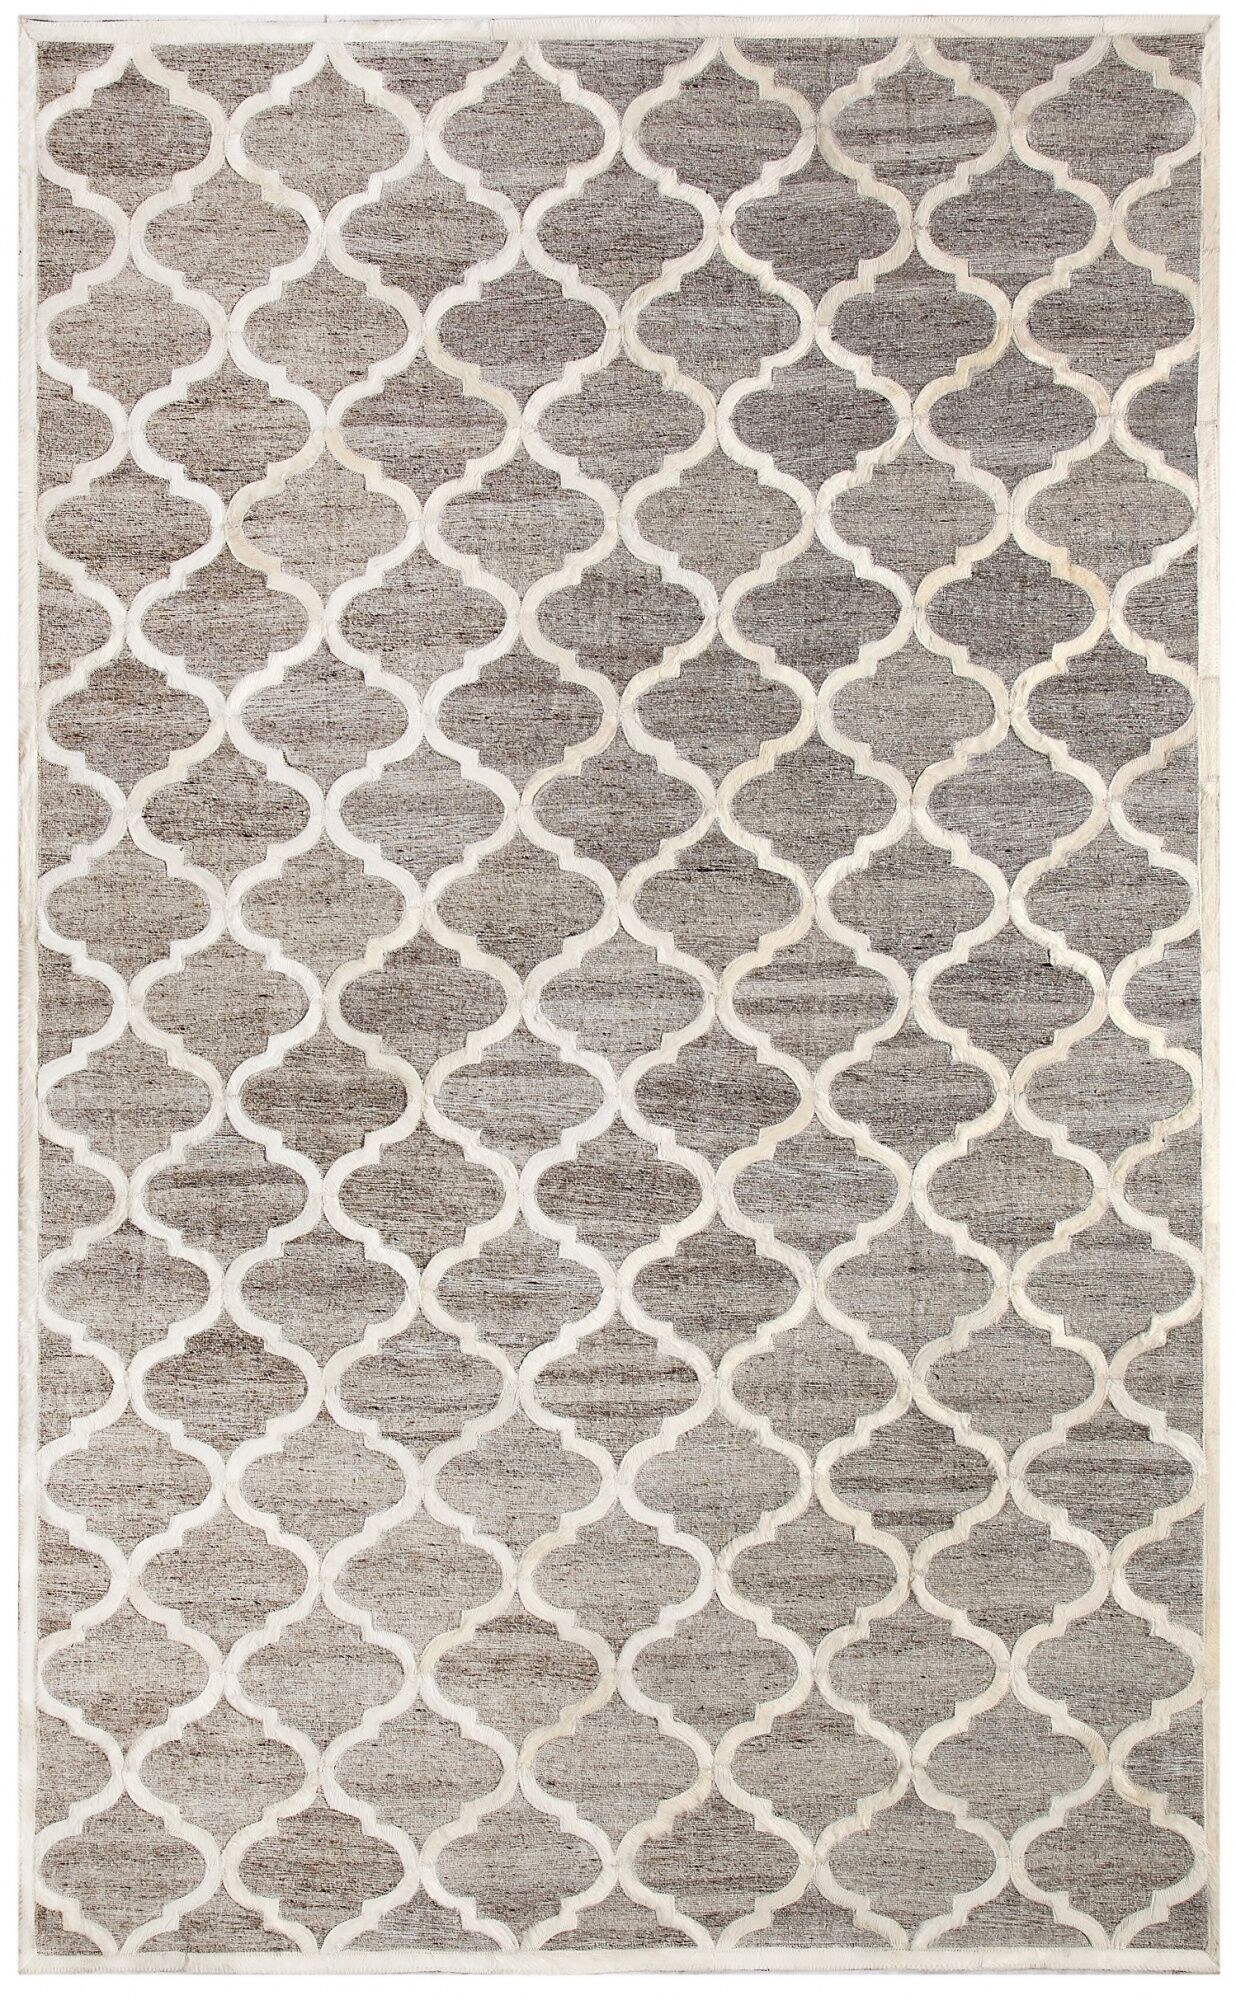 Ritz Hand-Woven Beige/Gray Area Rug Rug Size: Rectangle 8' x 11'